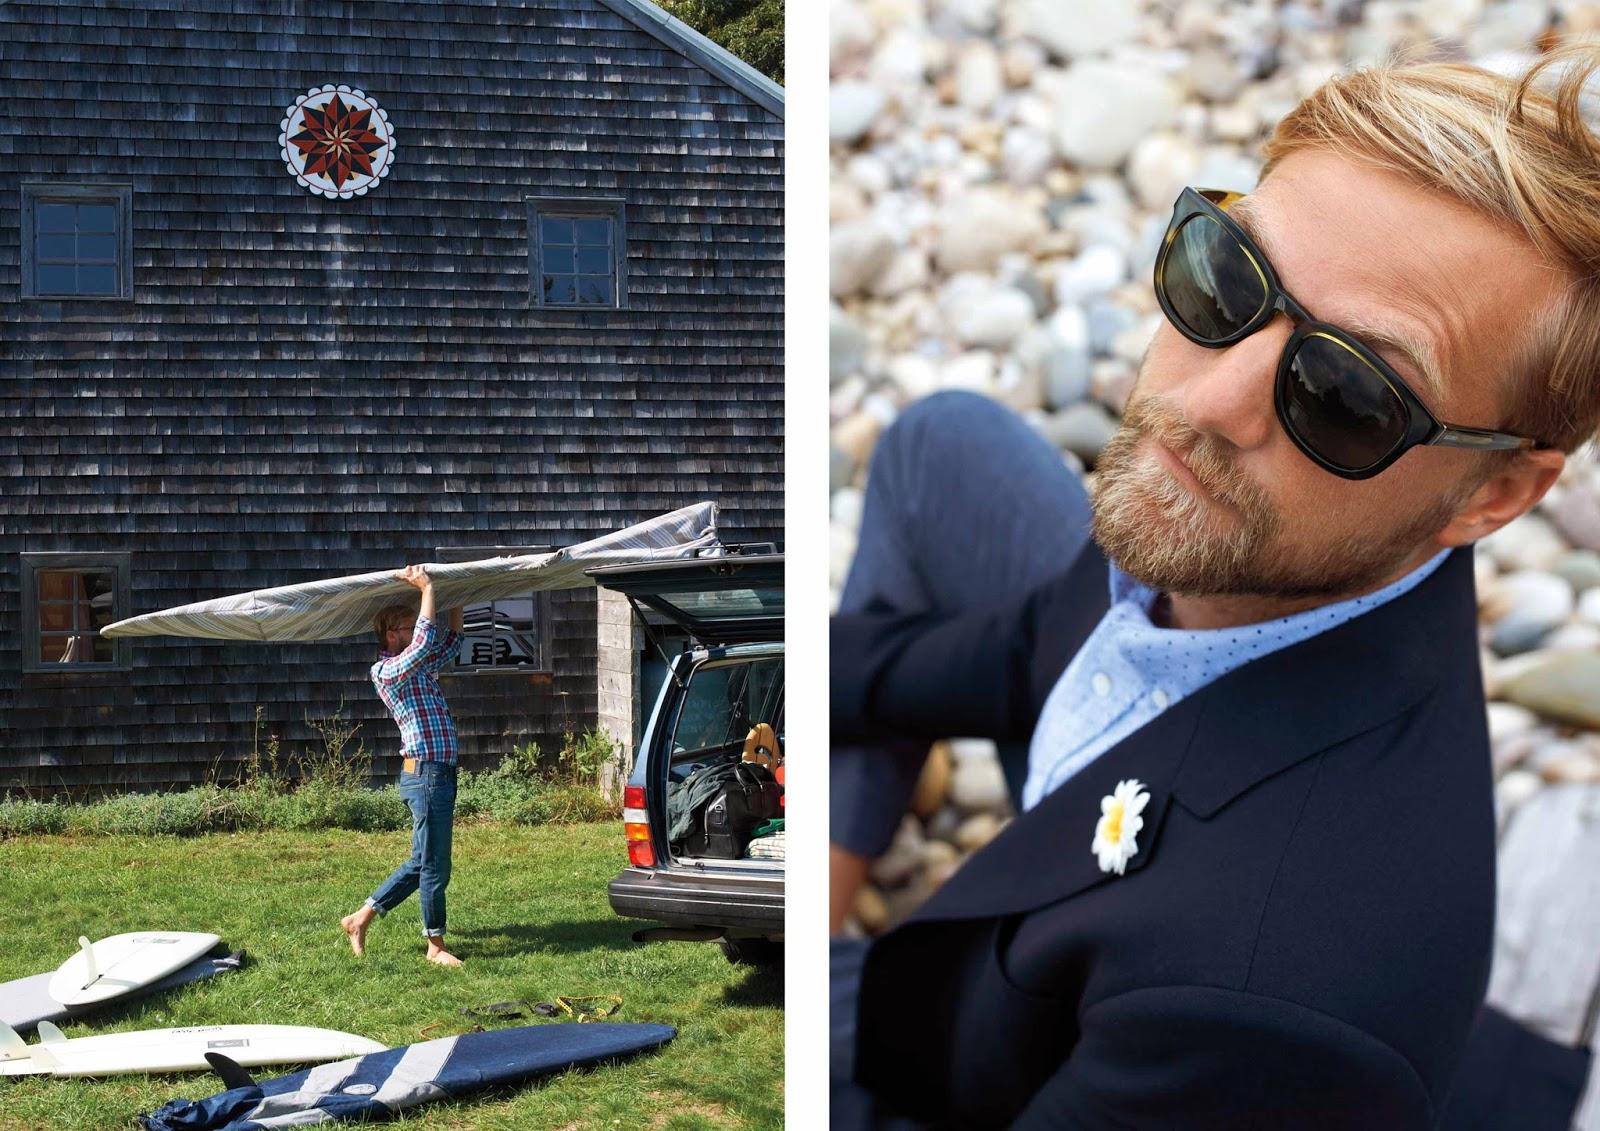 jack spade menswear, jack spade spring summer 2014, mikey detemple surfer jack spade, menswear photoshoot america